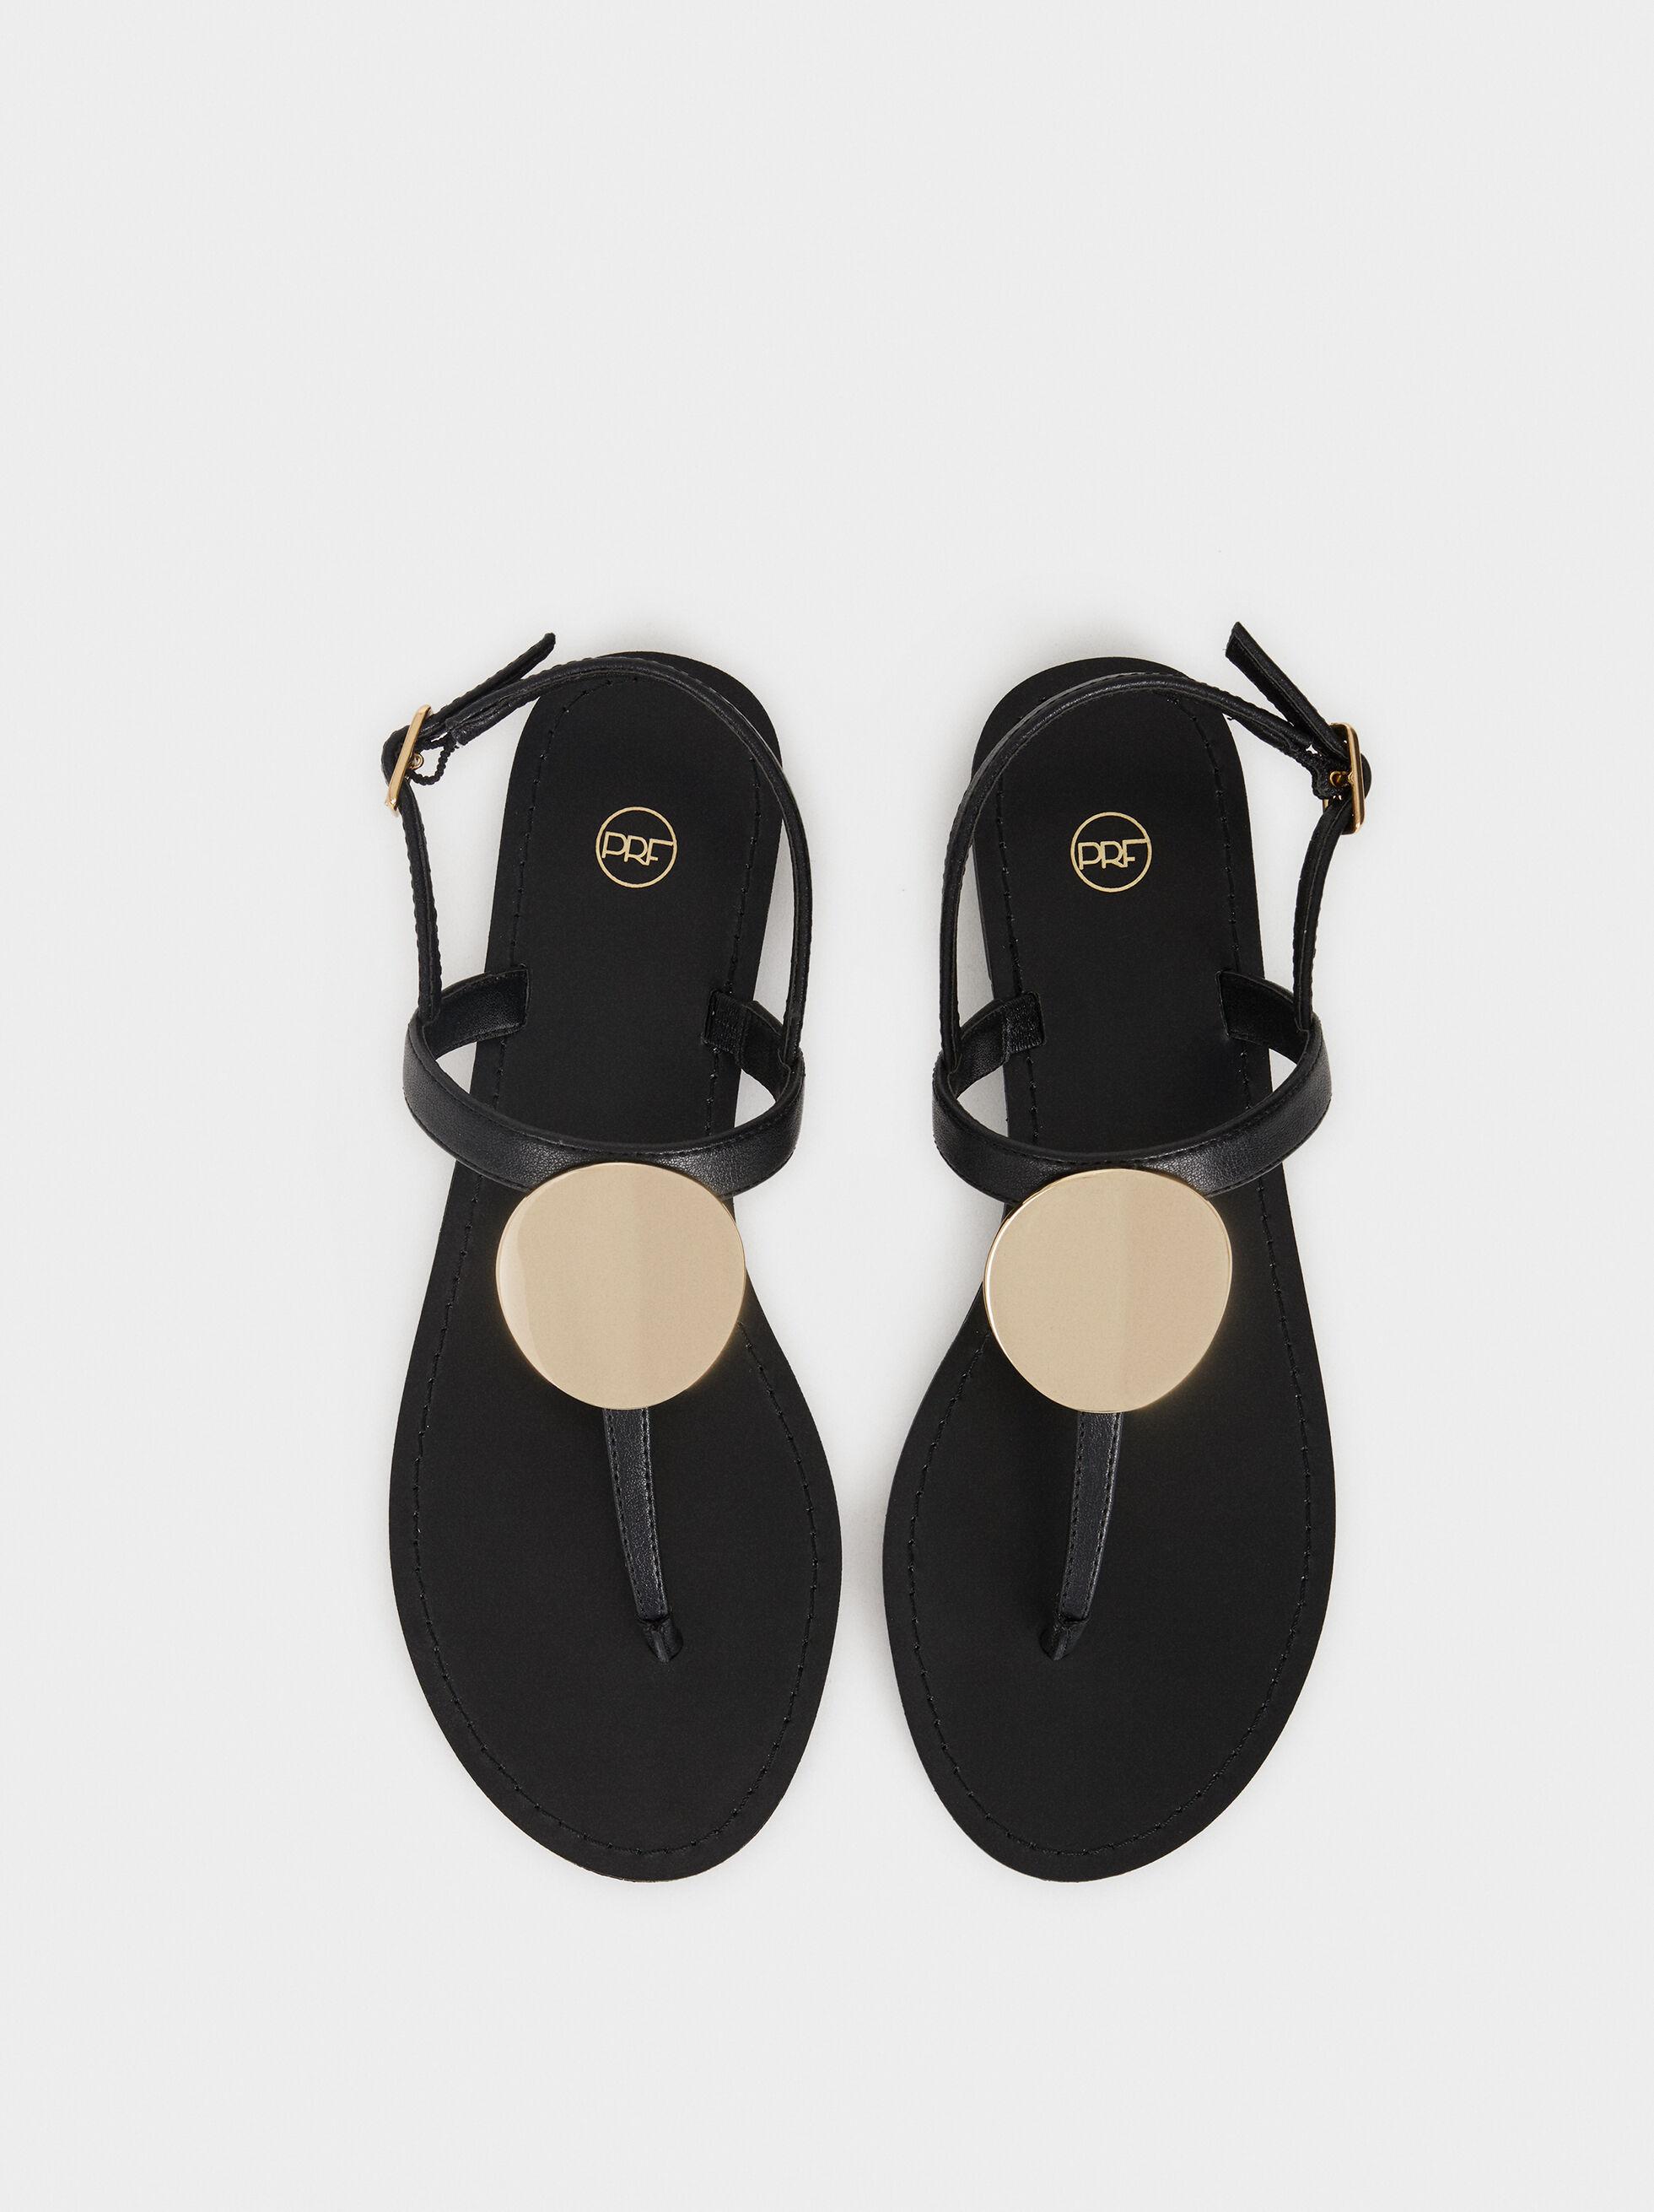 Flat Sandals With Metallic Detail, Black, hi-res